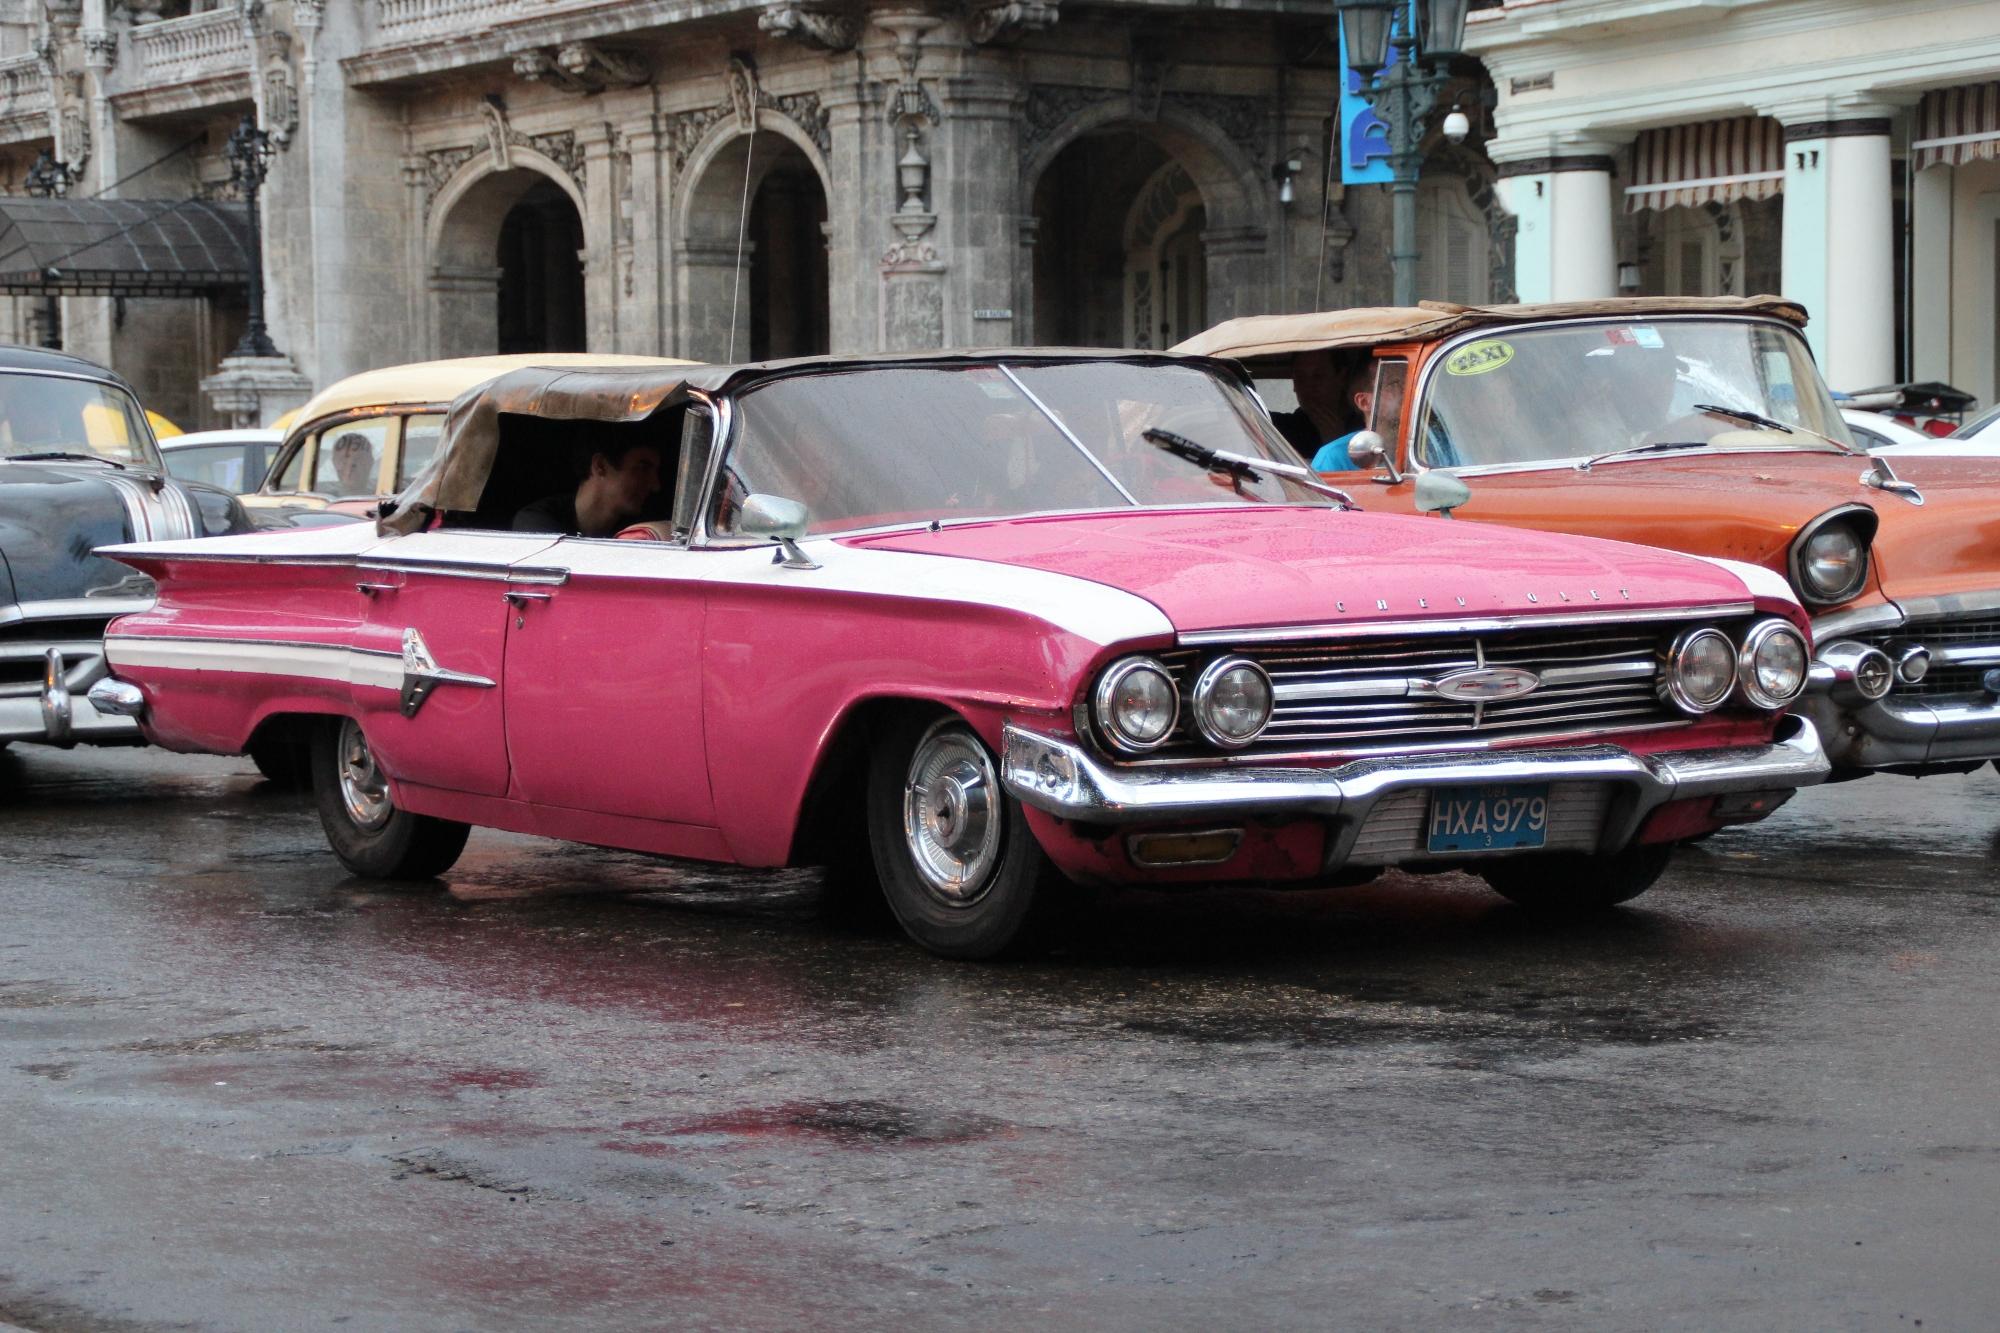 cuban classic cars prophorse. Black Bedroom Furniture Sets. Home Design Ideas